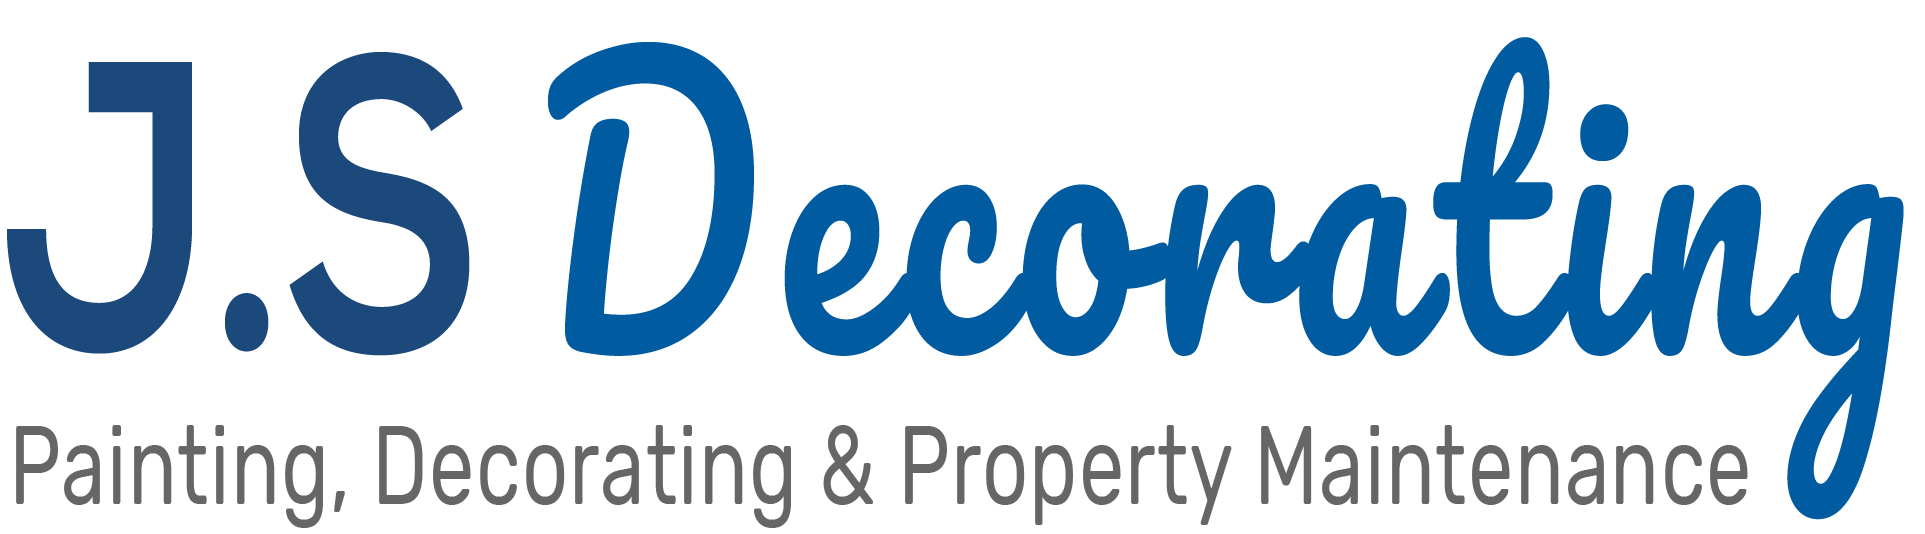 JS Decoratoring